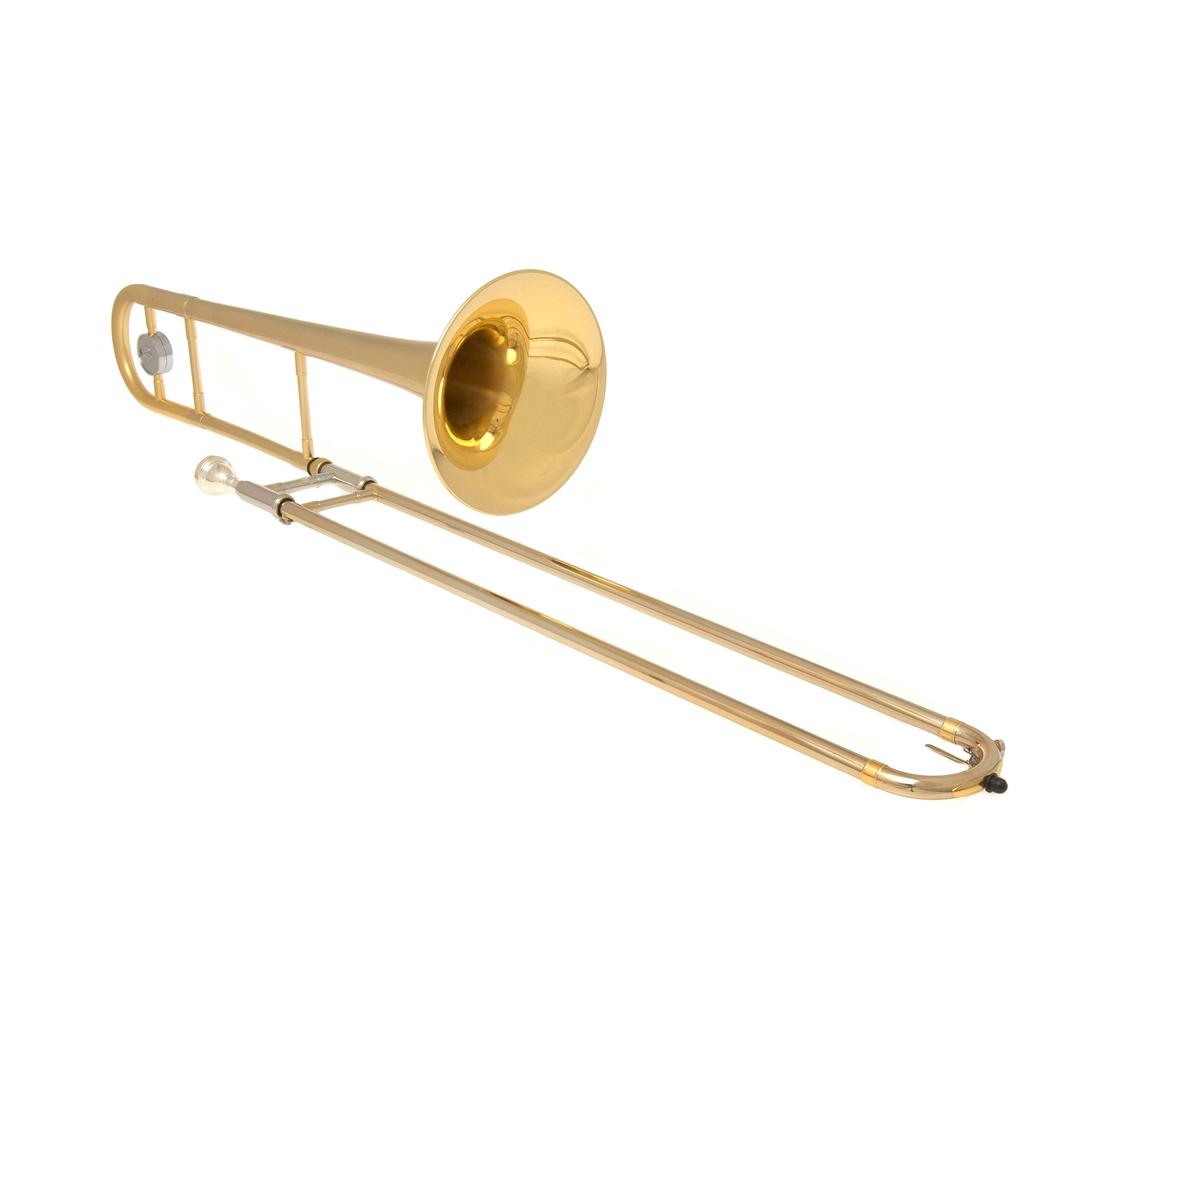 John Packer Tenor Trombone JP231RATHFG - Uitvoering: Verguld